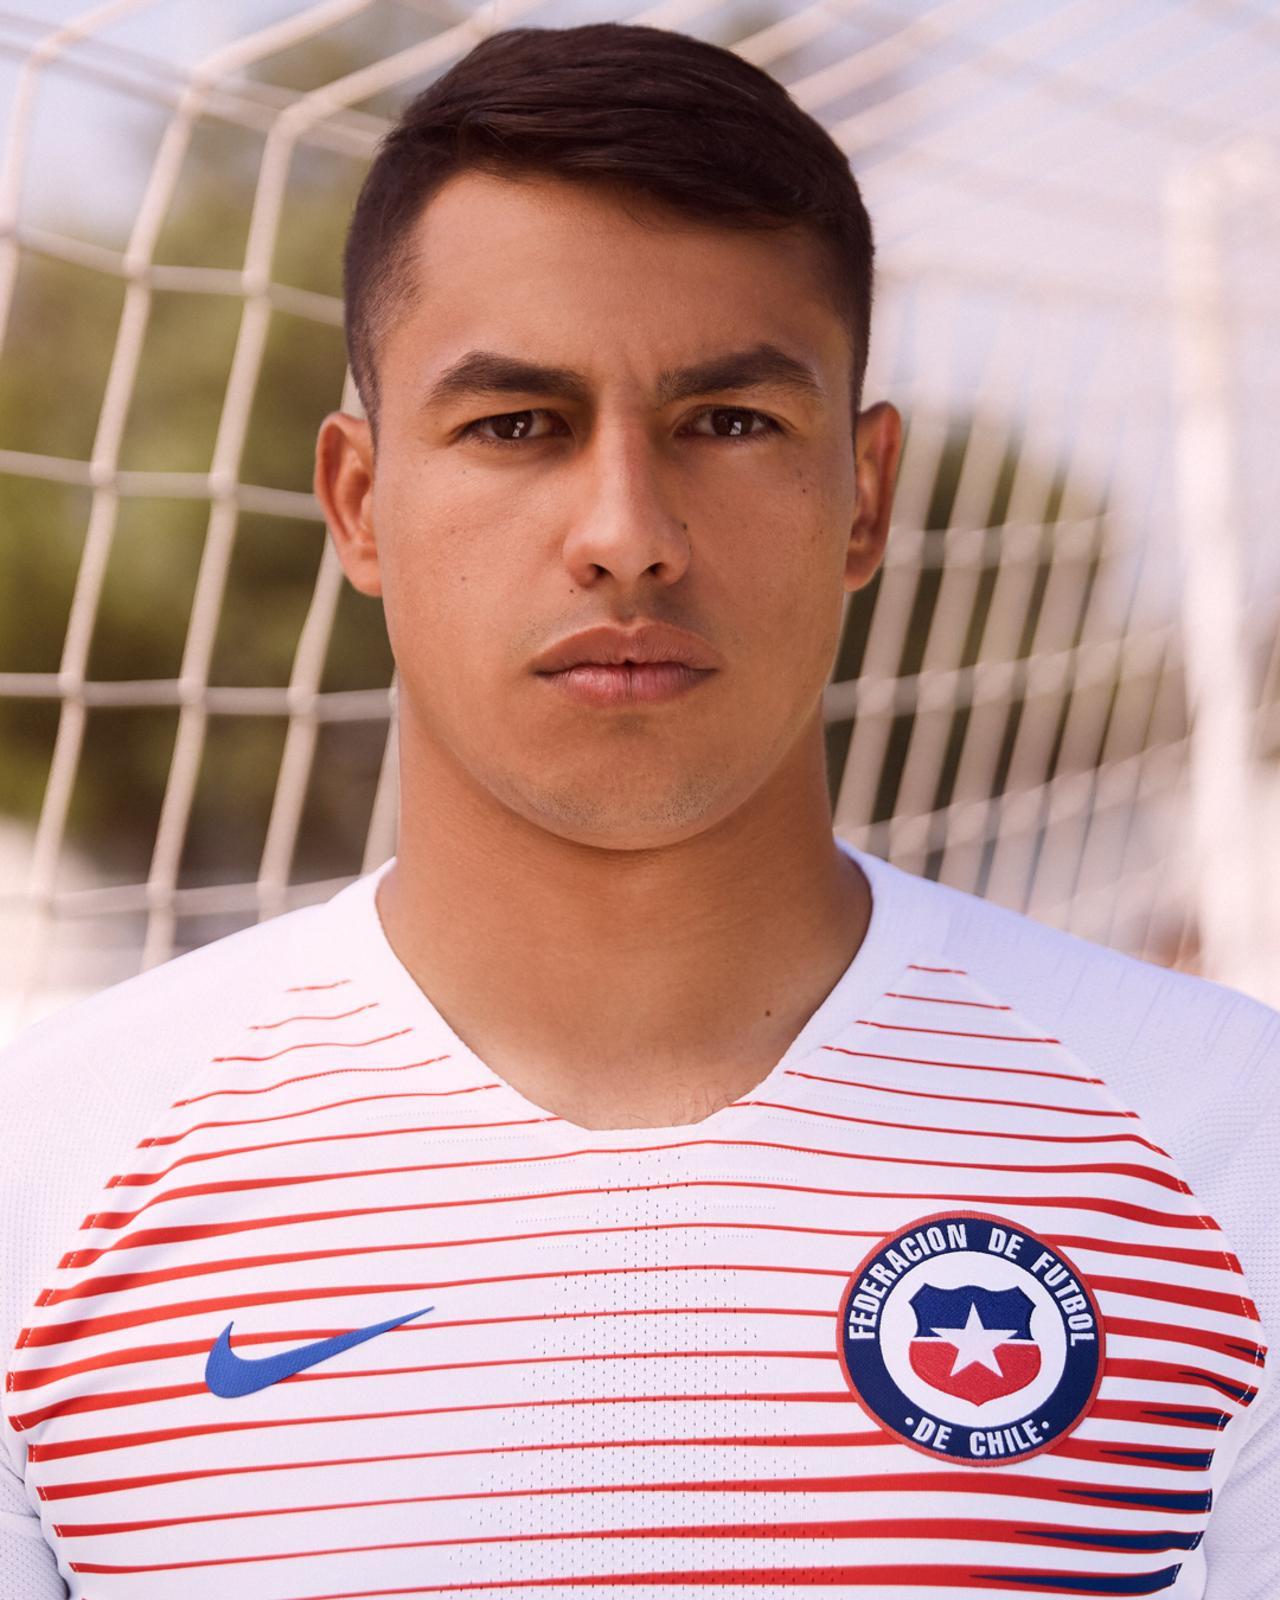 83b65da75 Chile Reveal 2018/19 Kit by Nike